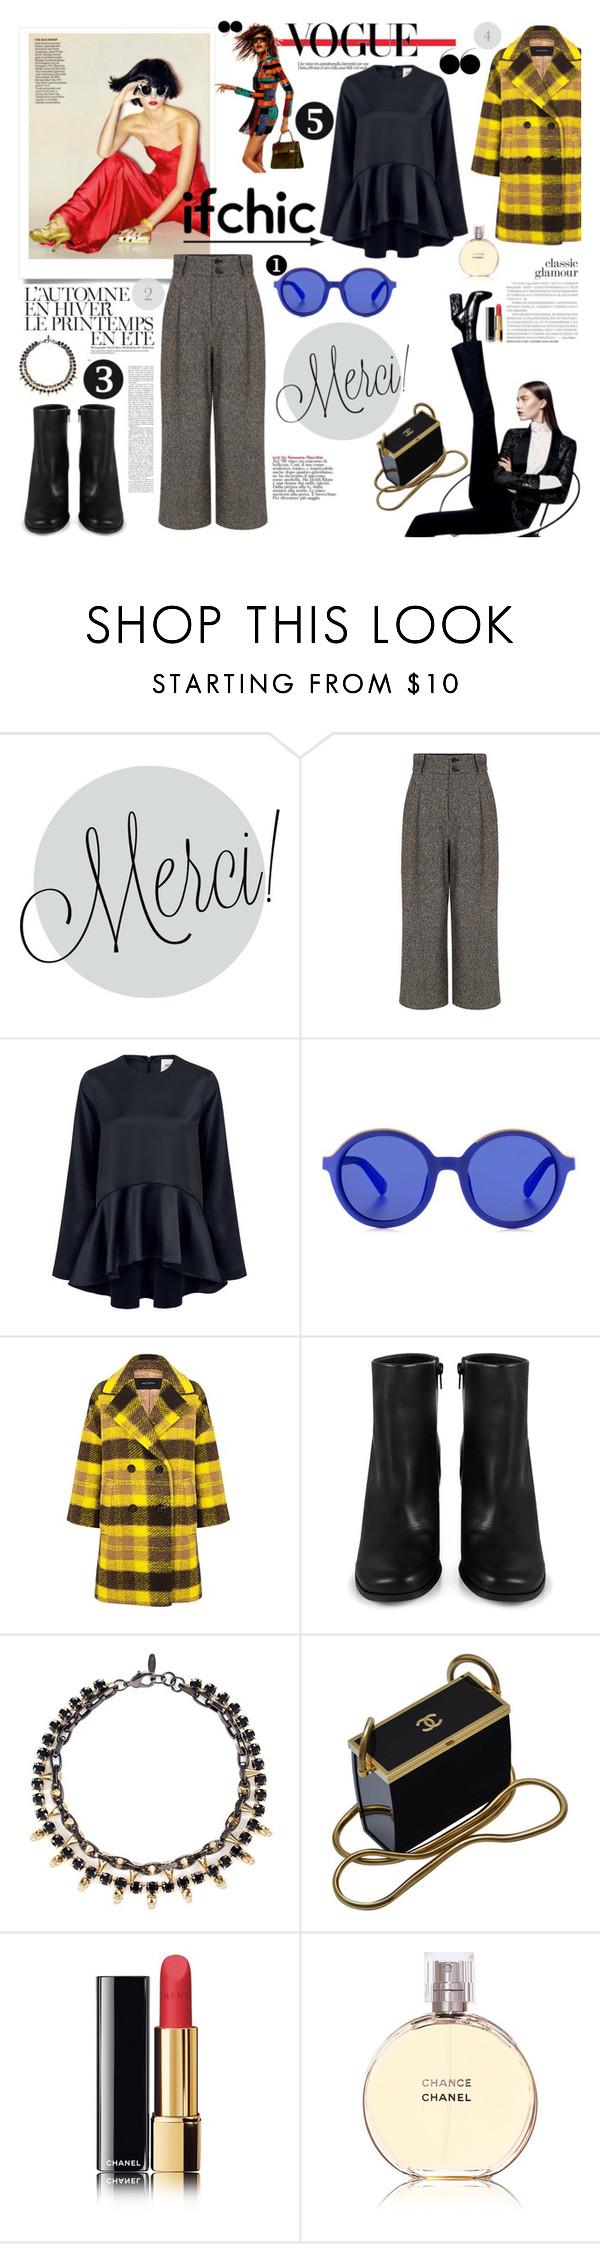 """Stylish with @ifchic.com"" by pieracuzman ❤ liked on Polyvore featuring Dunn, Pink Tartan, Edit, Etnia Barcelona, Miista, Été Swim, Joomi Lim and Chanel"